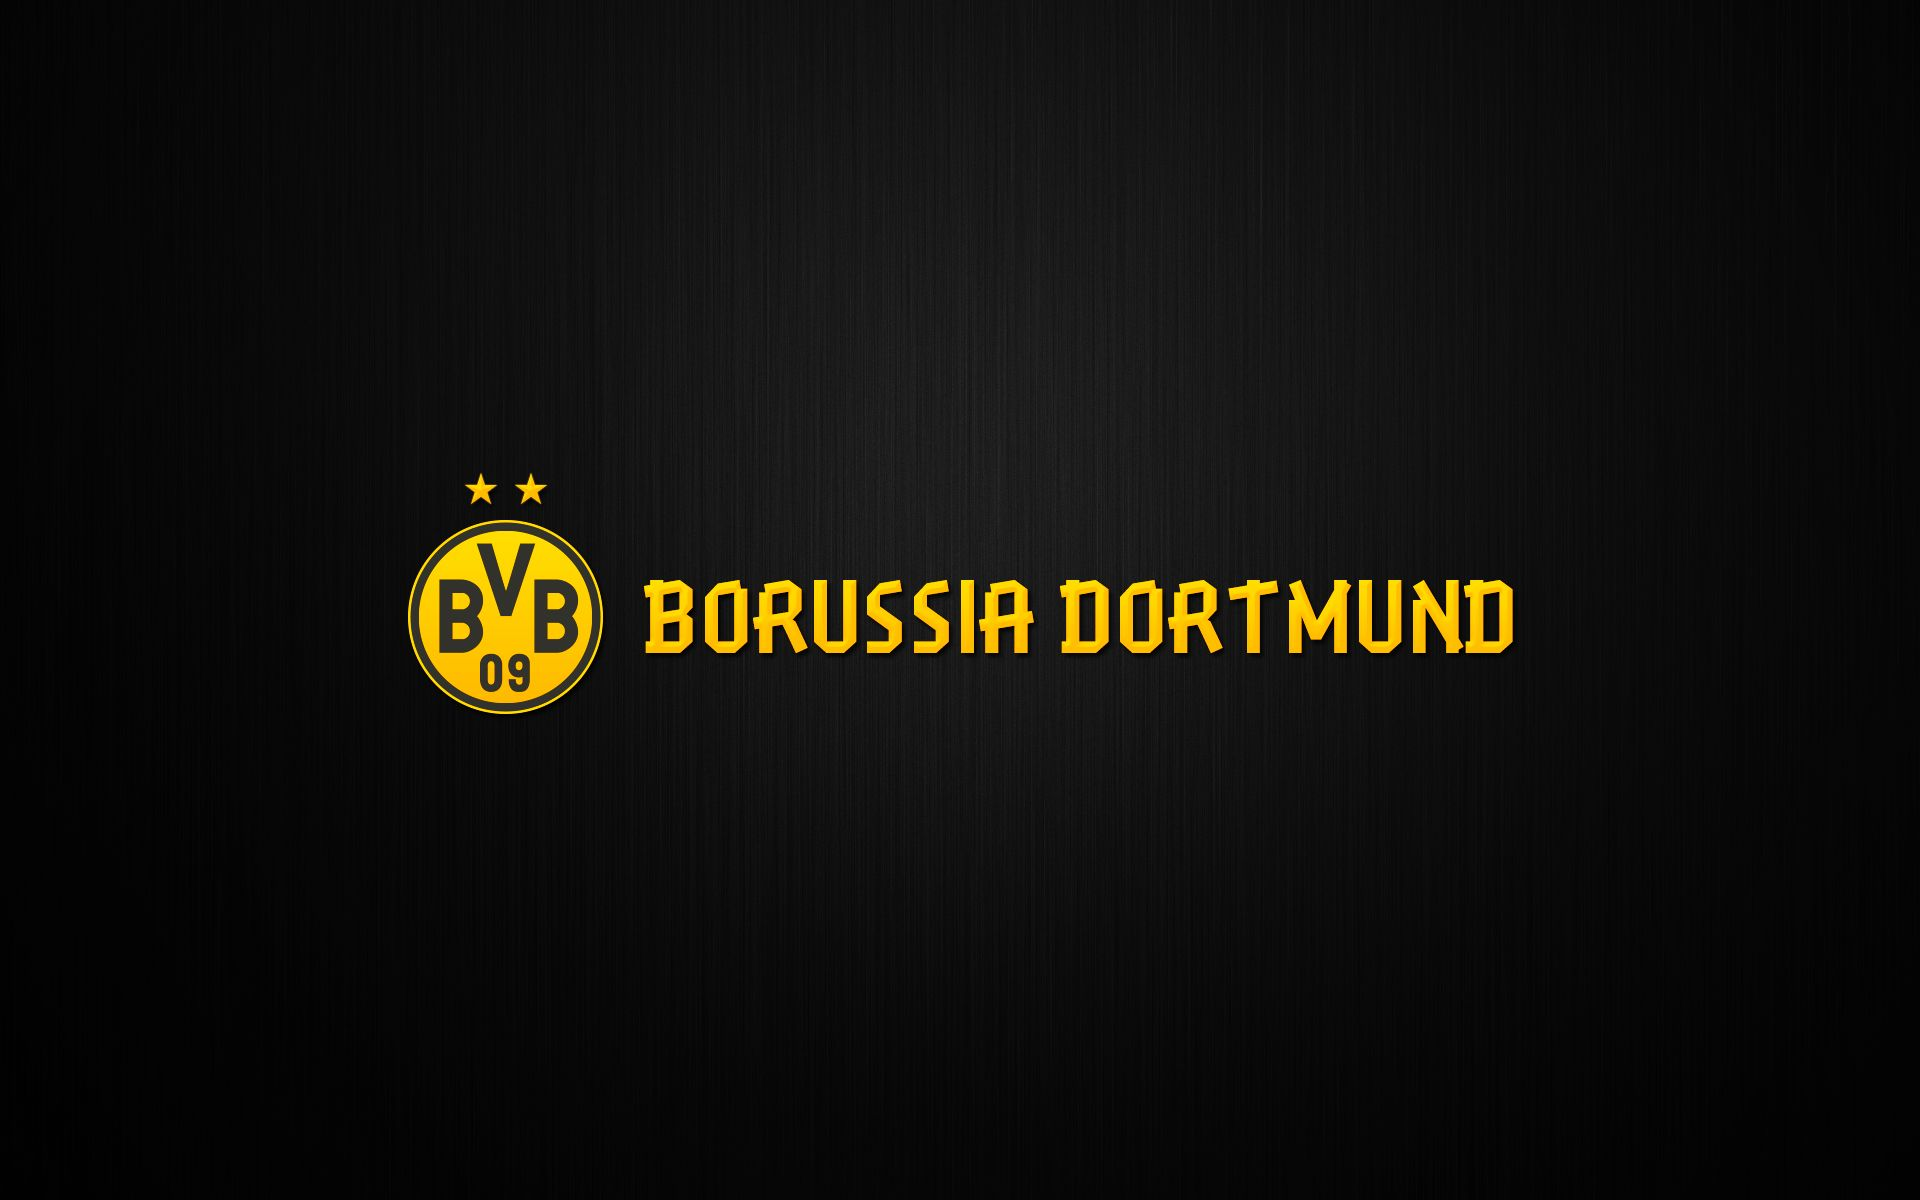 Bvb Wallpaper 1920 1200 Bvb Wallpaper 32 Wallpapers Adorable Wallpapers Borussia Dortmund Dortmund Borussia Dortmund Wallpaper